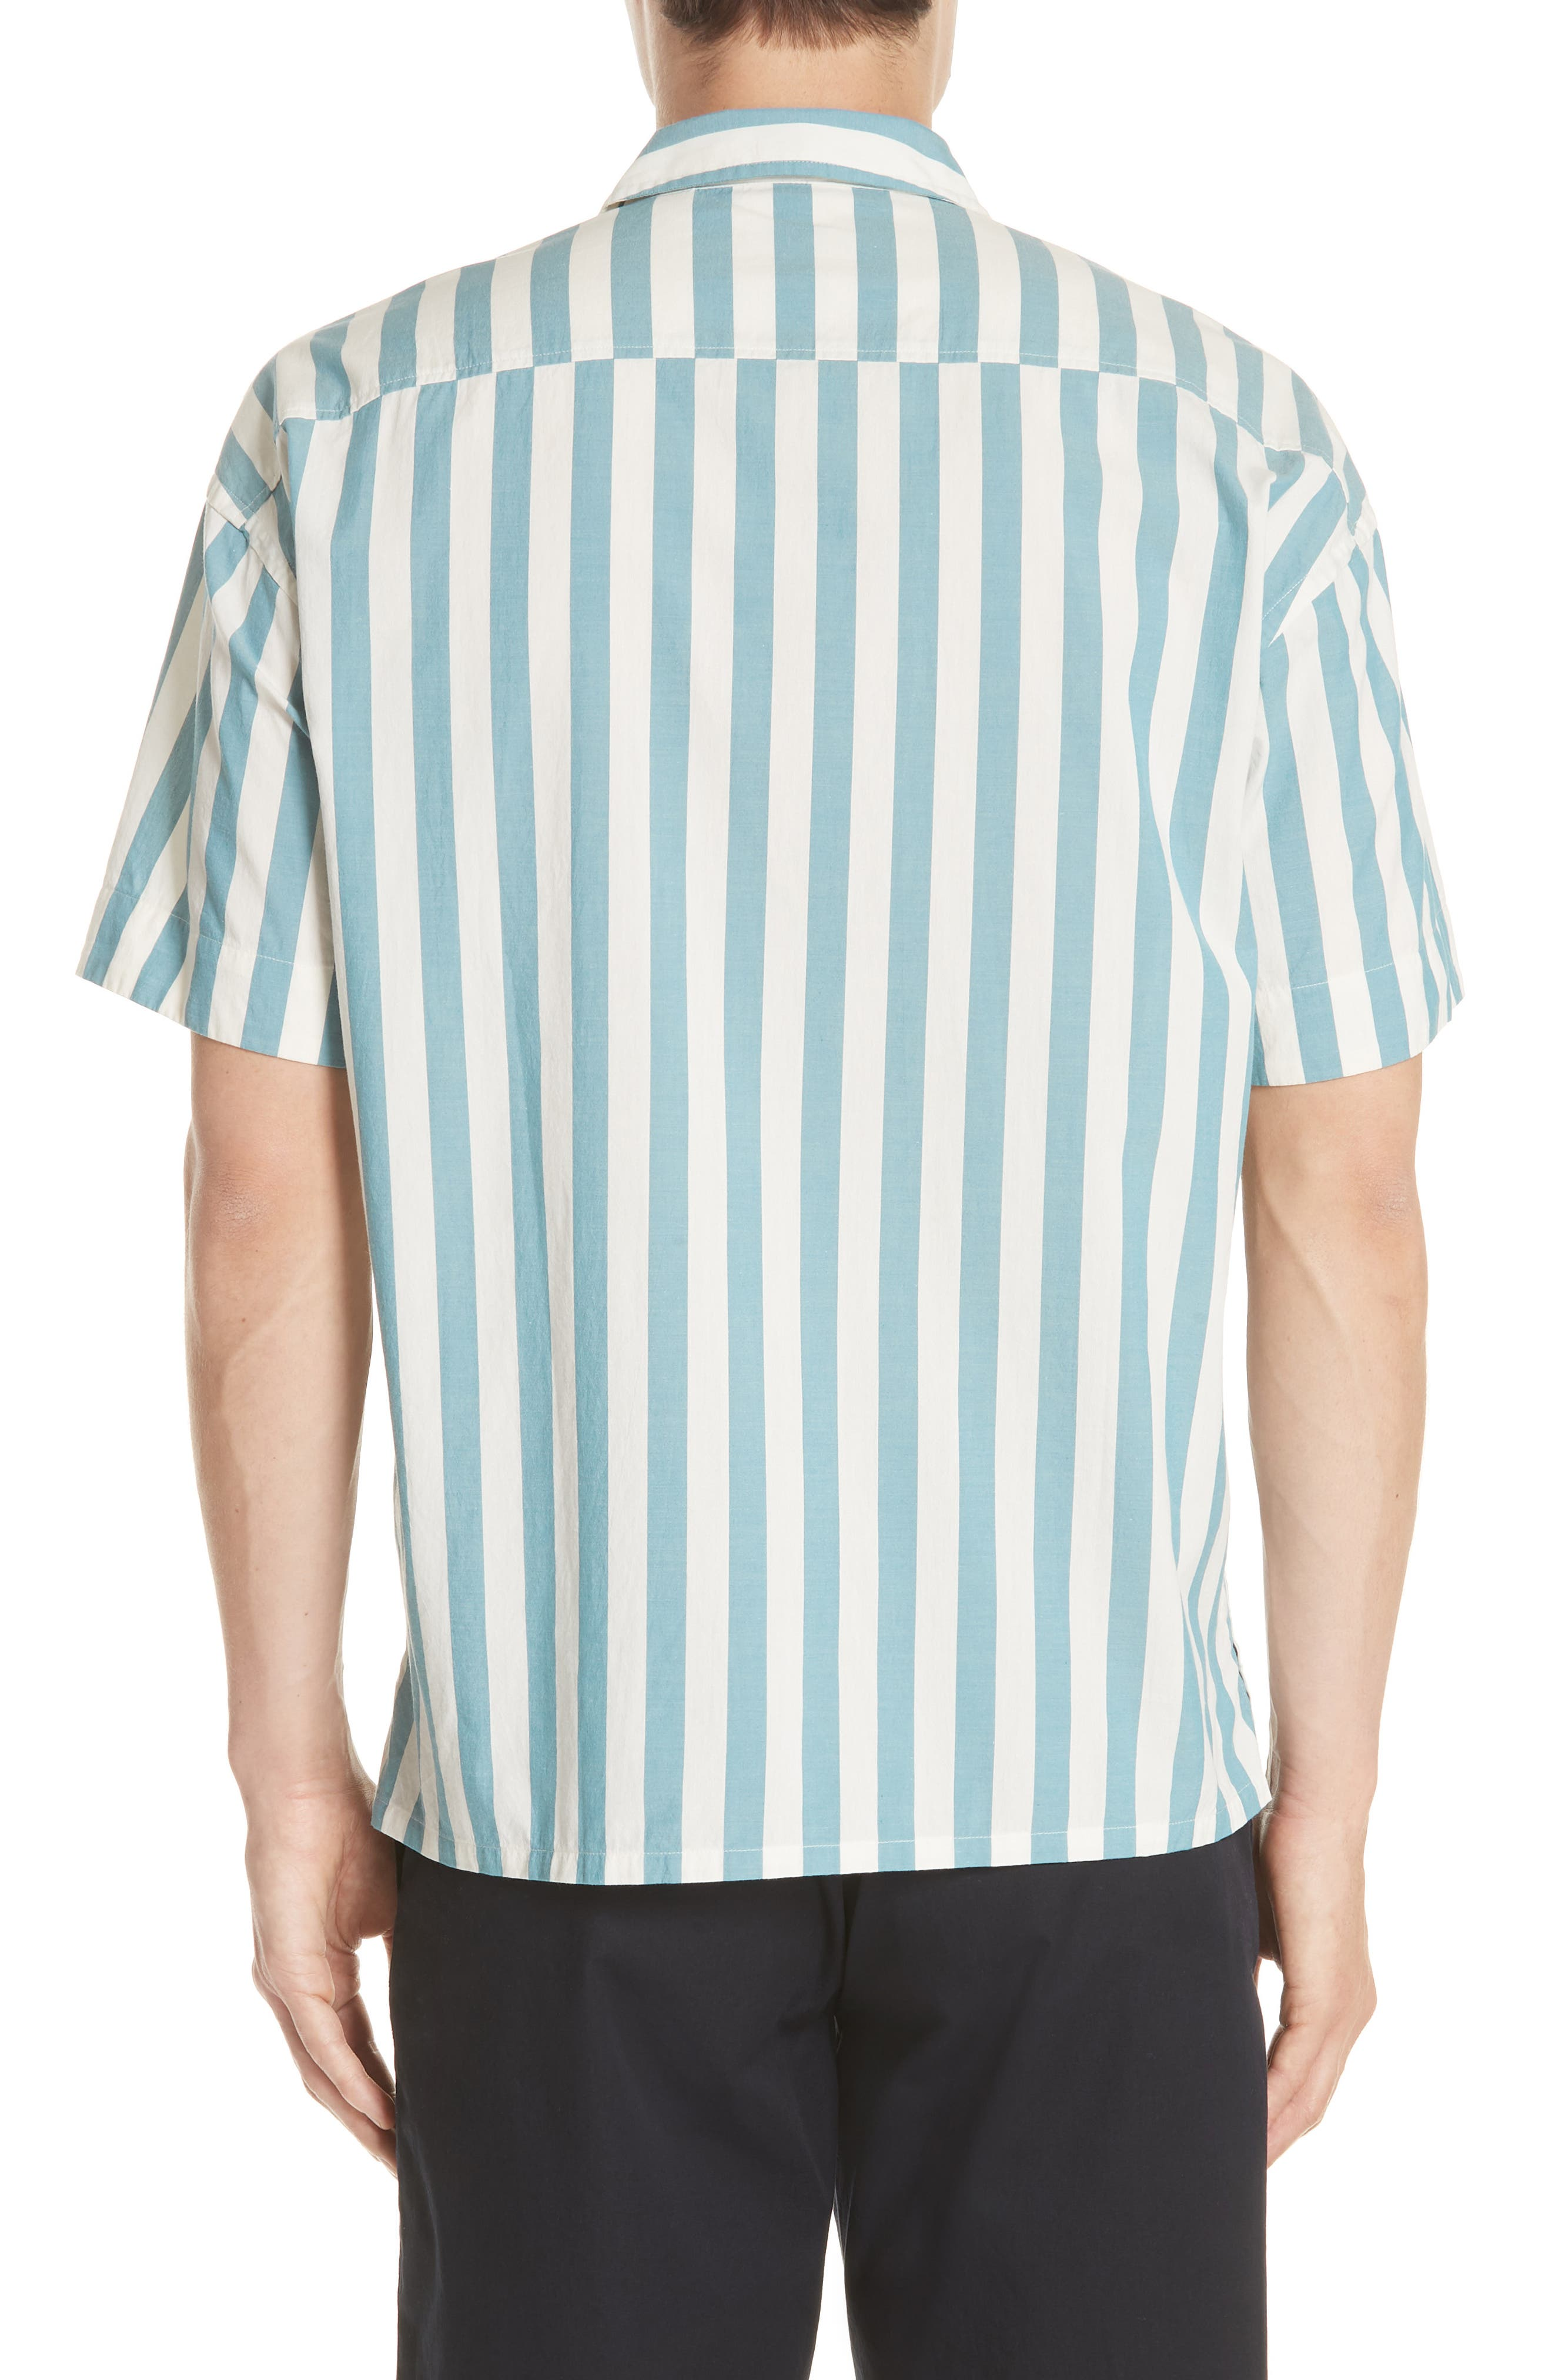 Harley Stripe Shirt,                             Alternate thumbnail 3, color,                             Pale Opal